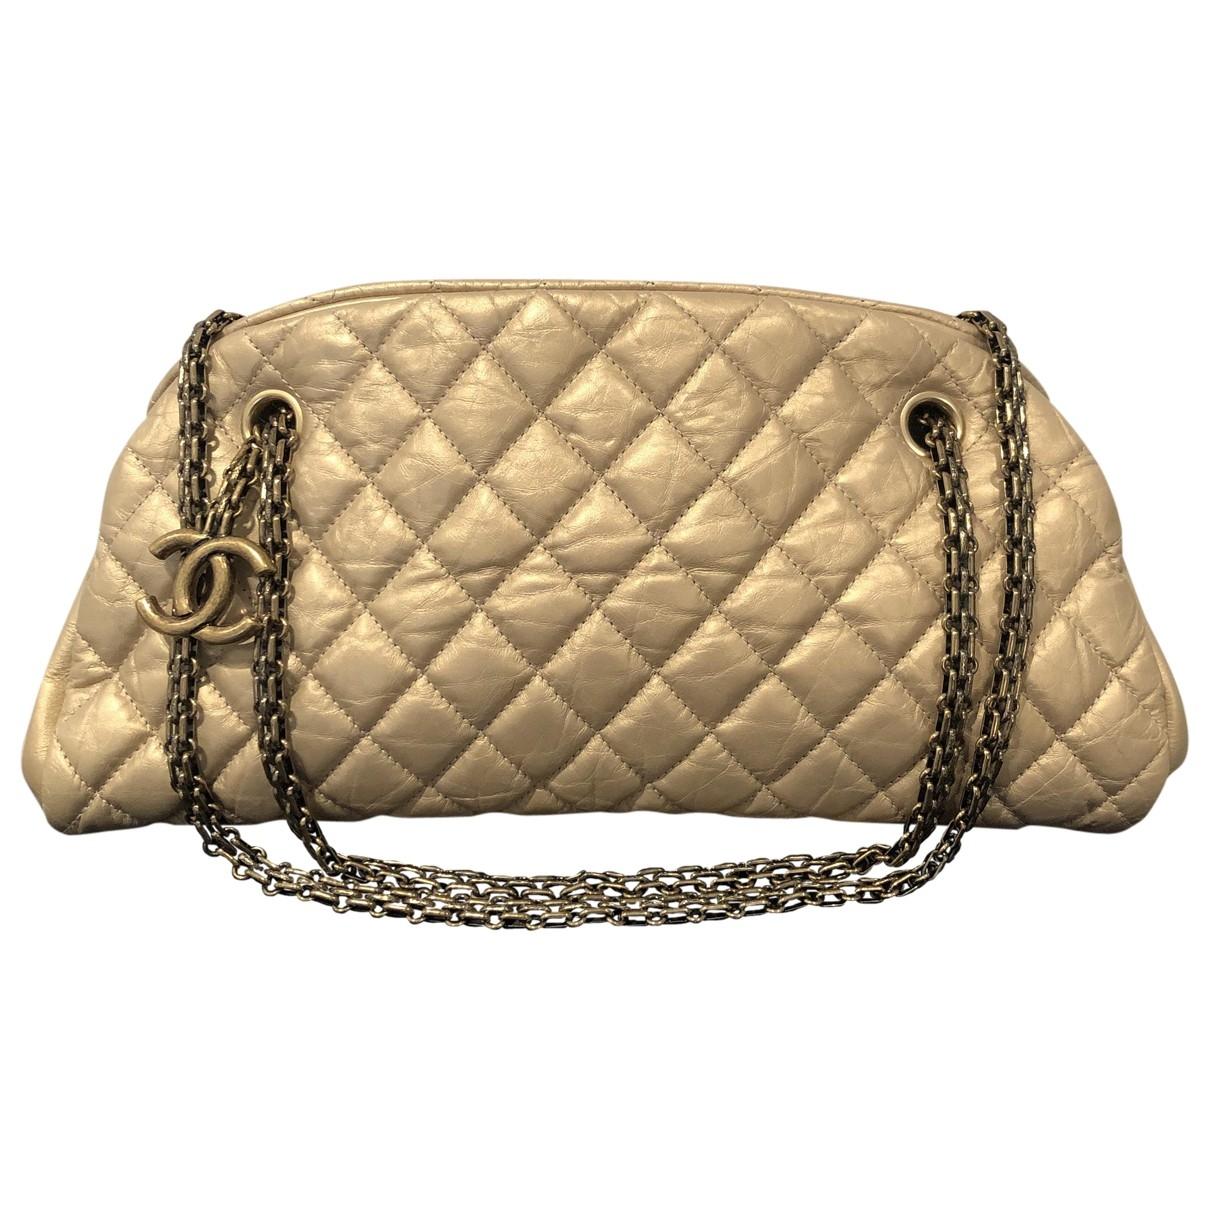 Chanel Mademoiselle Handtasche in  Gold Leder